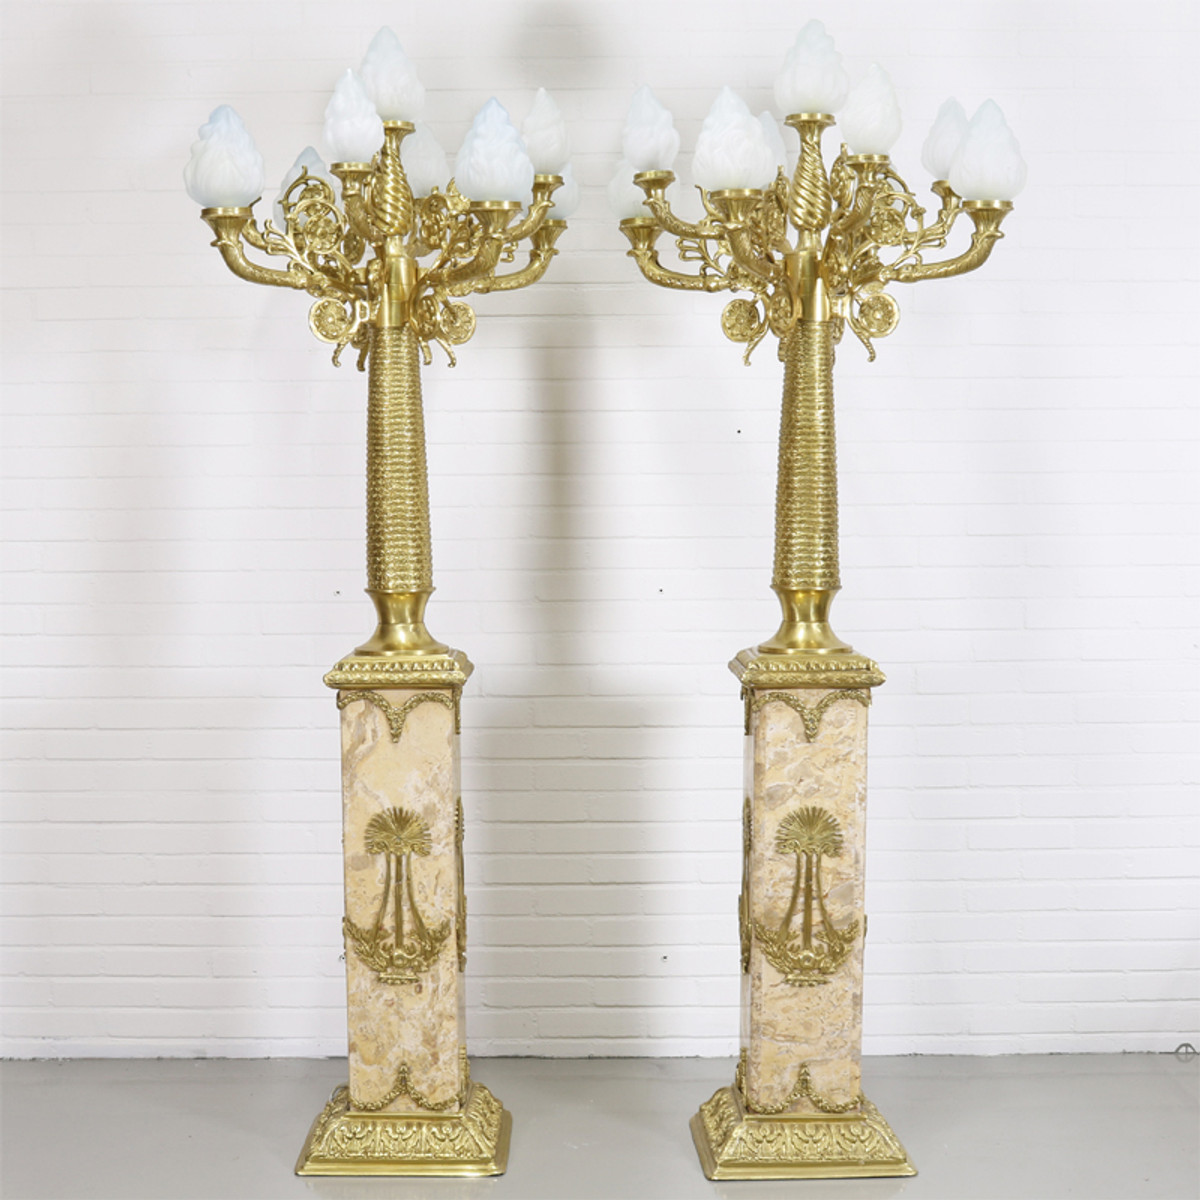 Casa Padrino Barock Stand Kronleuchter Mit Marmor Säulen Set Mod1 Creme /  Gold   Edel U0026 Prunkvoll